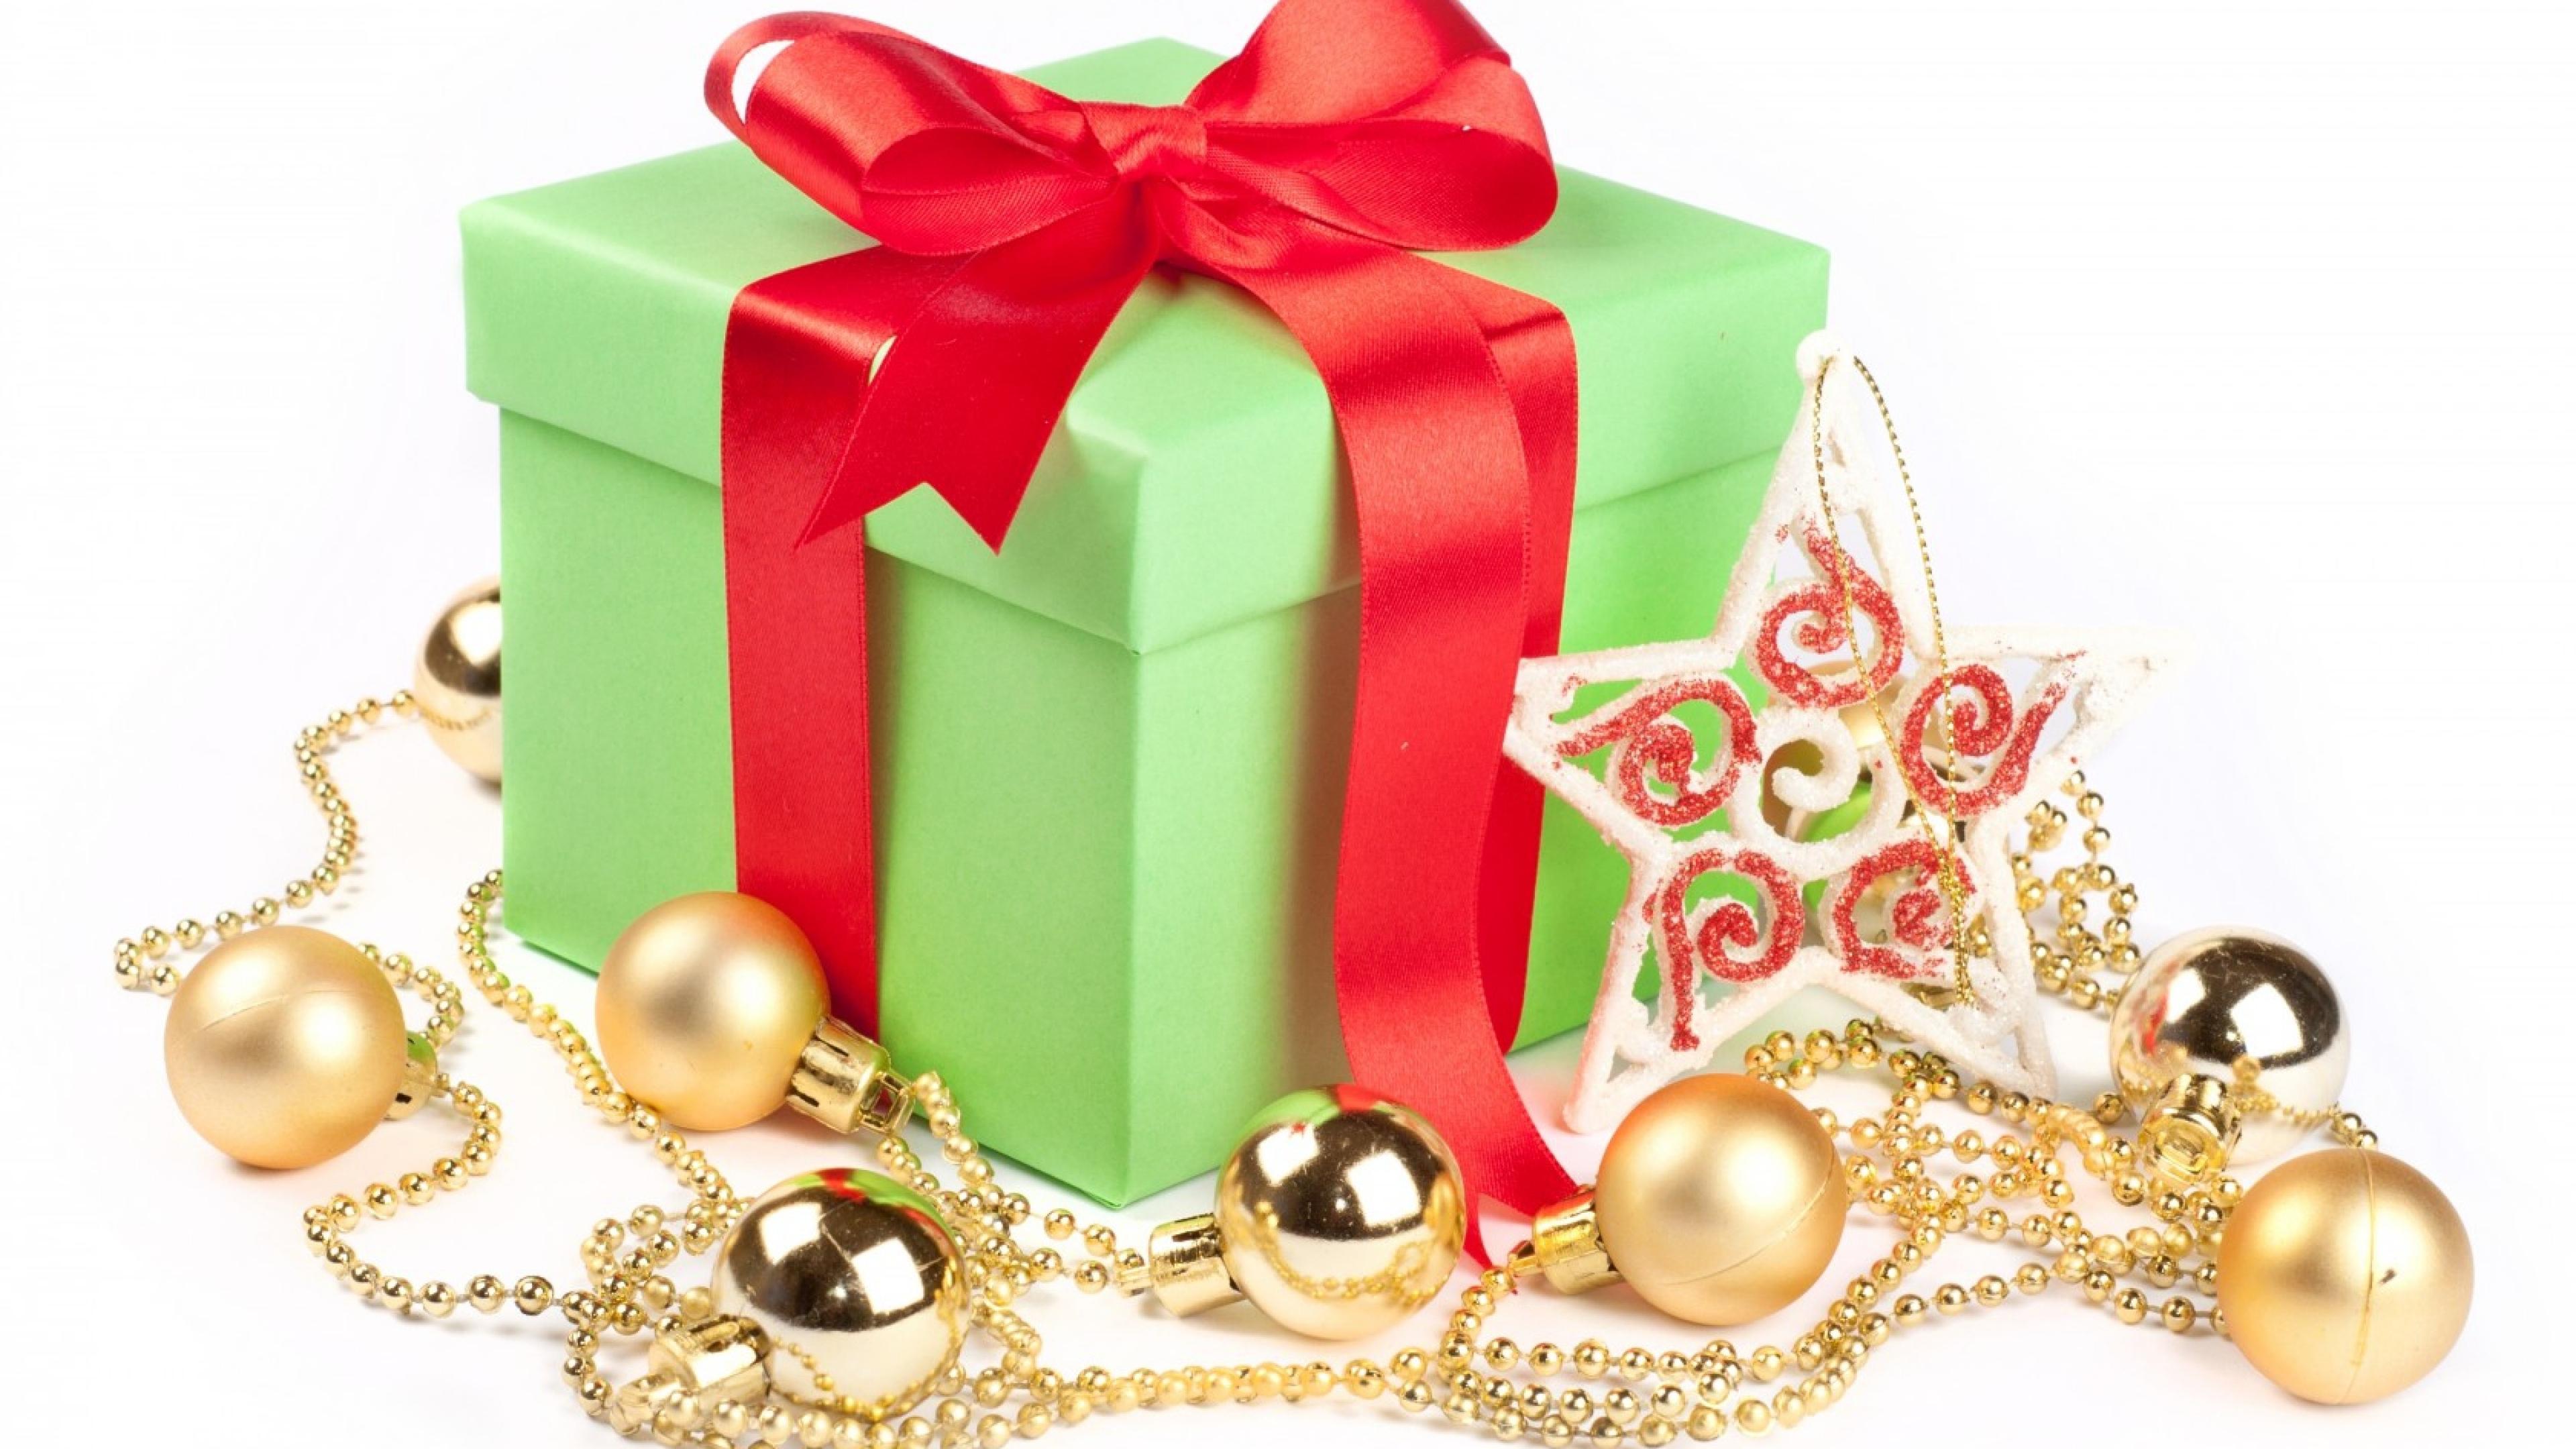 3840x2160 Wallpaper box, gift, ribbon, star, balls, christmas, new year